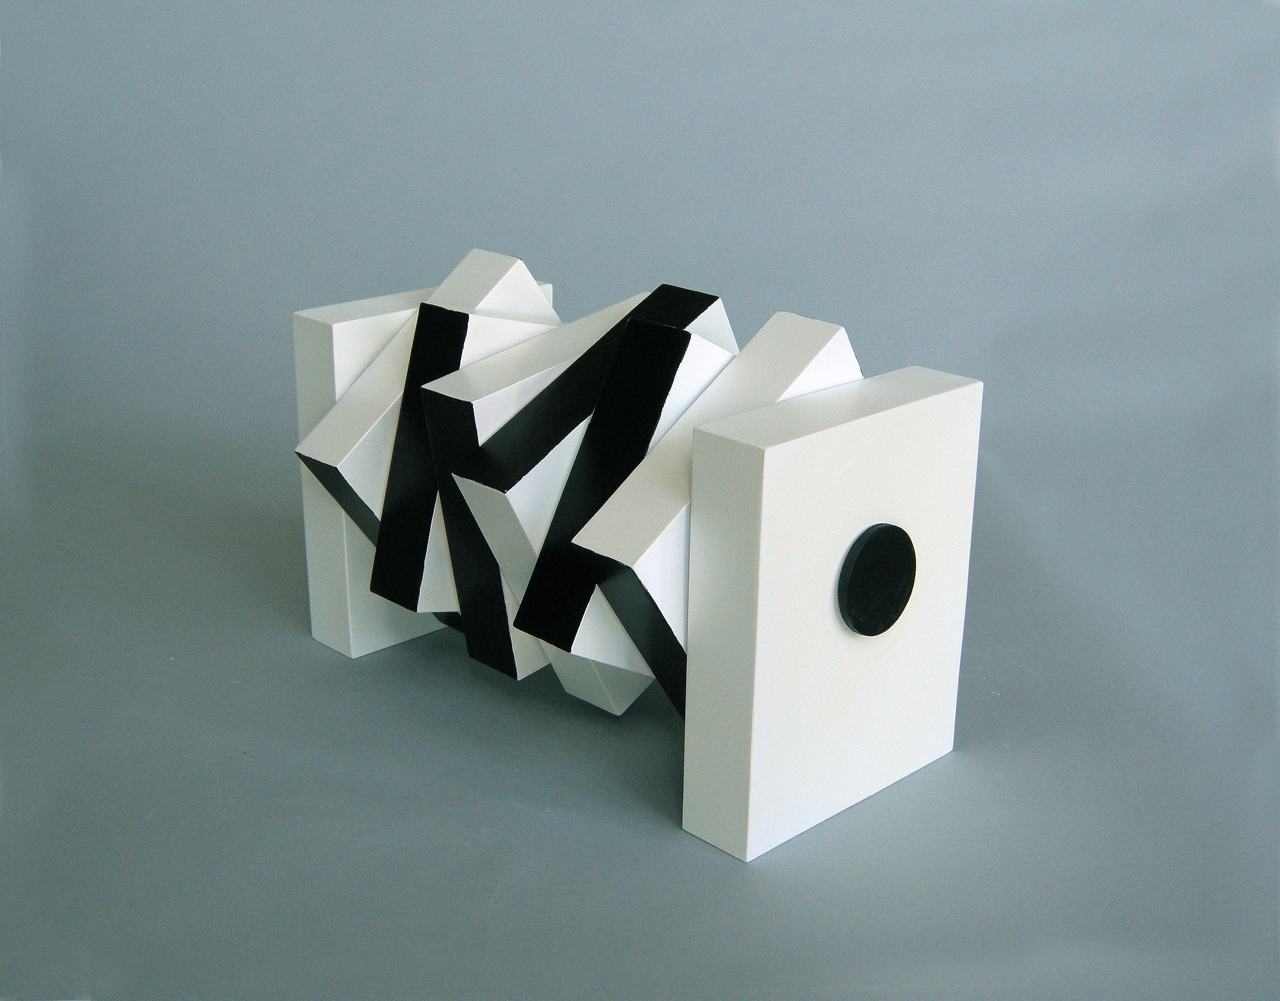 Interactive-Segmented-Tables-Michael-Jantzen-8